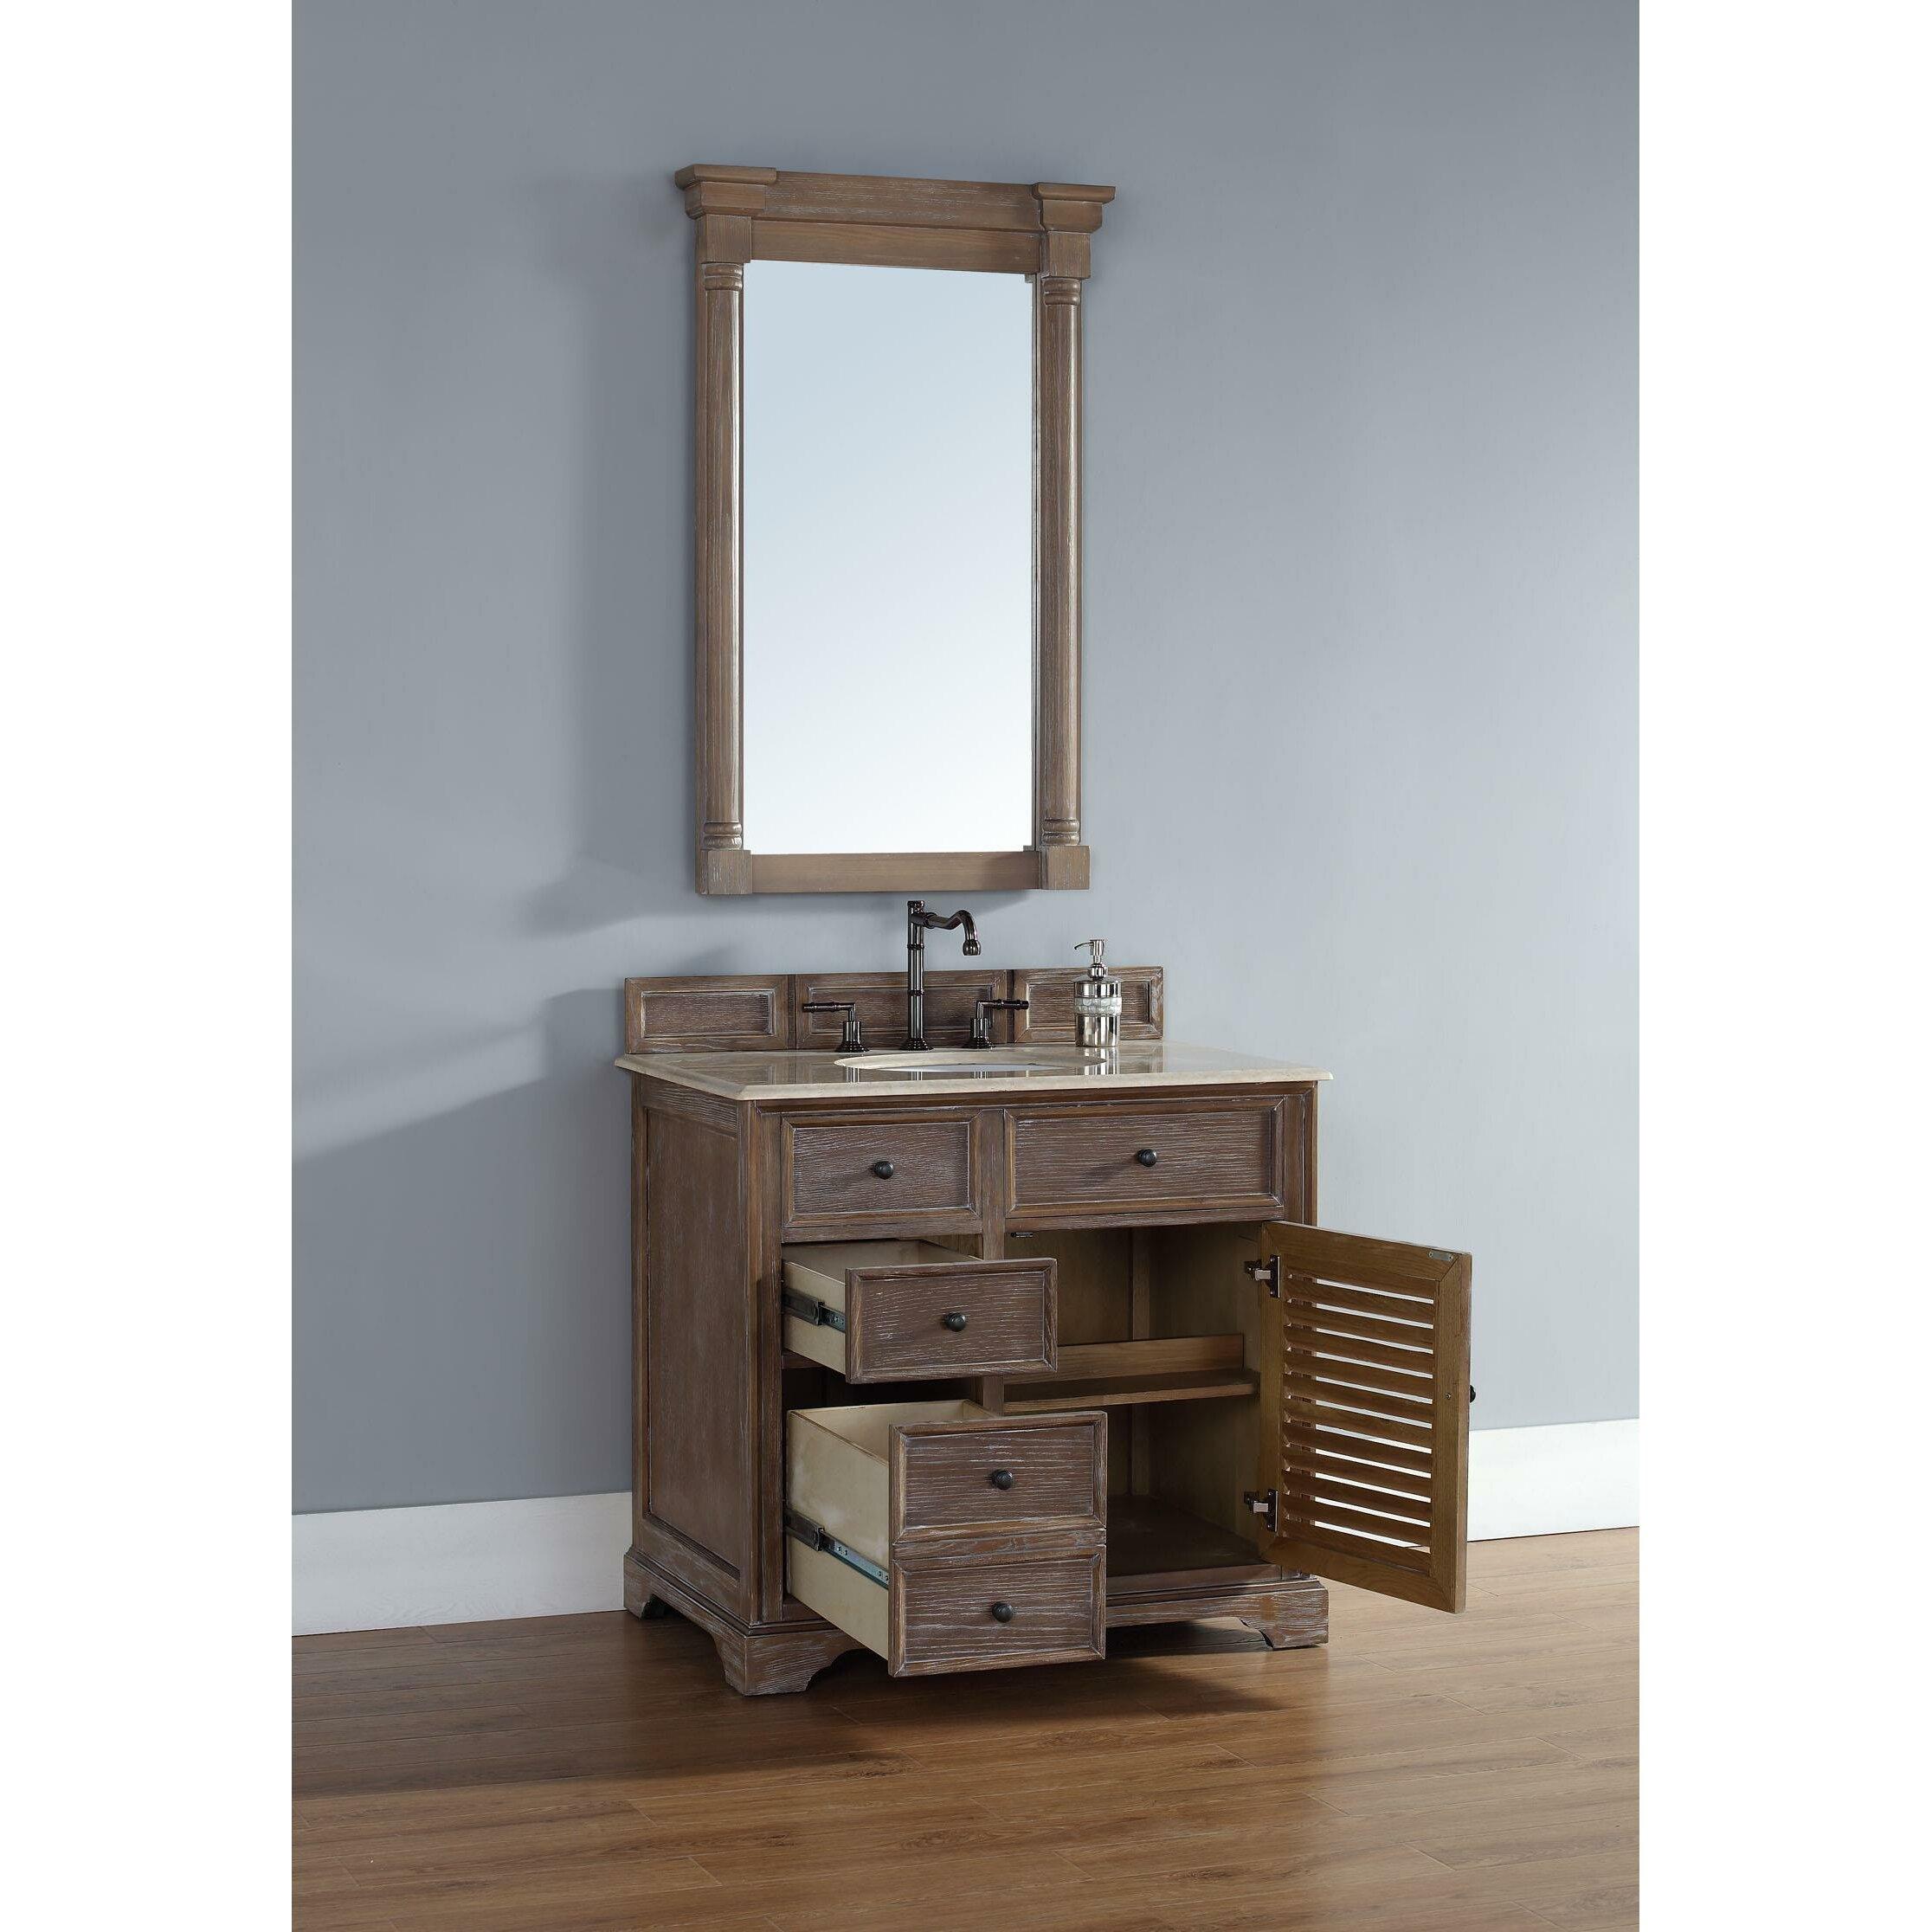 Bathroom Vanity Base James Martin Furniture Savannah 36 Single Bathroom Vanity Base